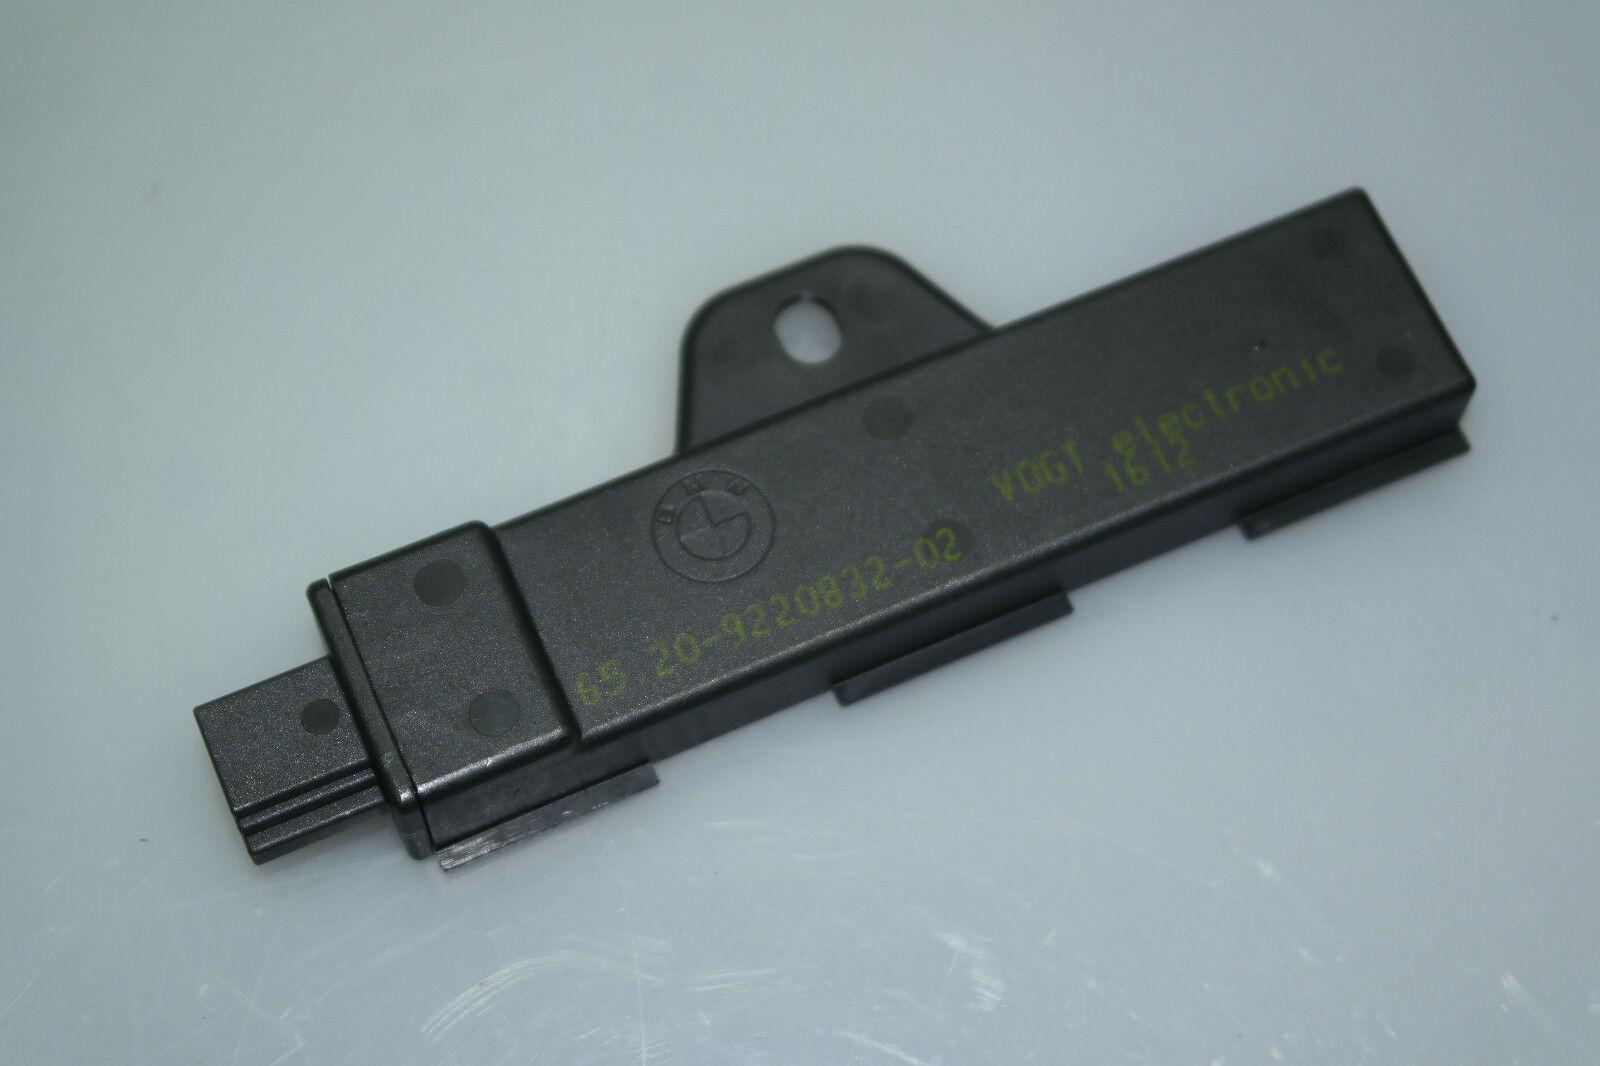 BMW 7er F01 F02 5er F07 F10 F11 Innenraumantenne Komfortzugang Antenne 9220832